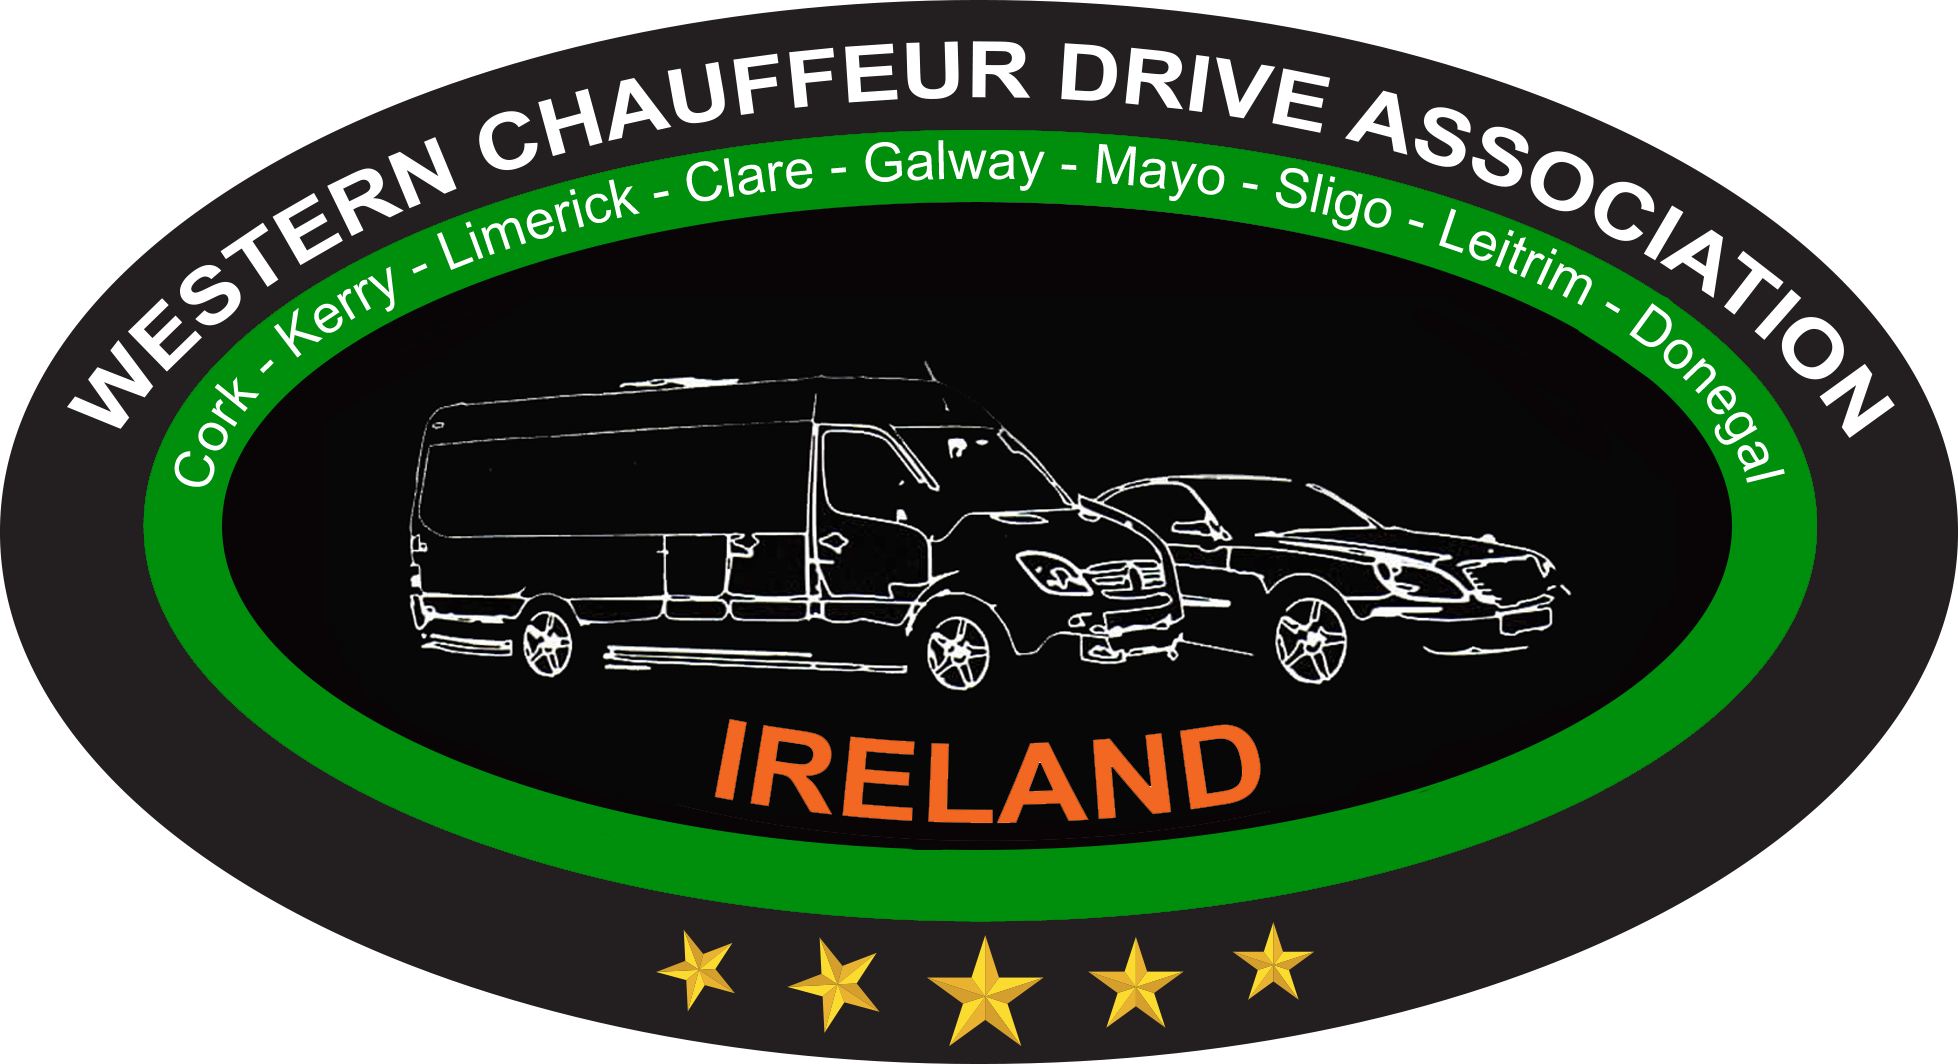 Western Chauffeur Drive Association Ireland